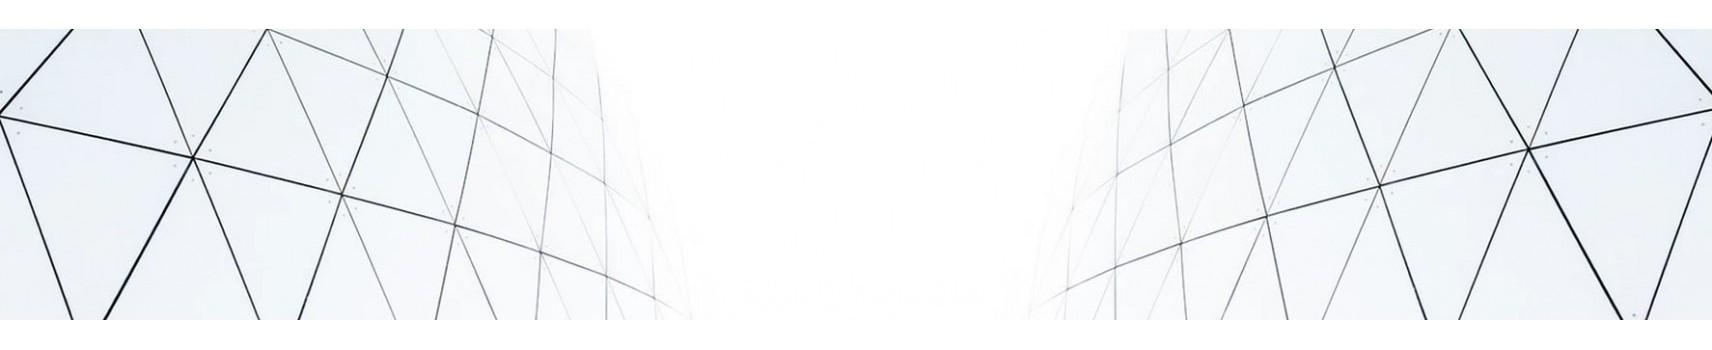 Sillas de Ruedas Bariátricas | Ortopedia | Envío Gratis 48h